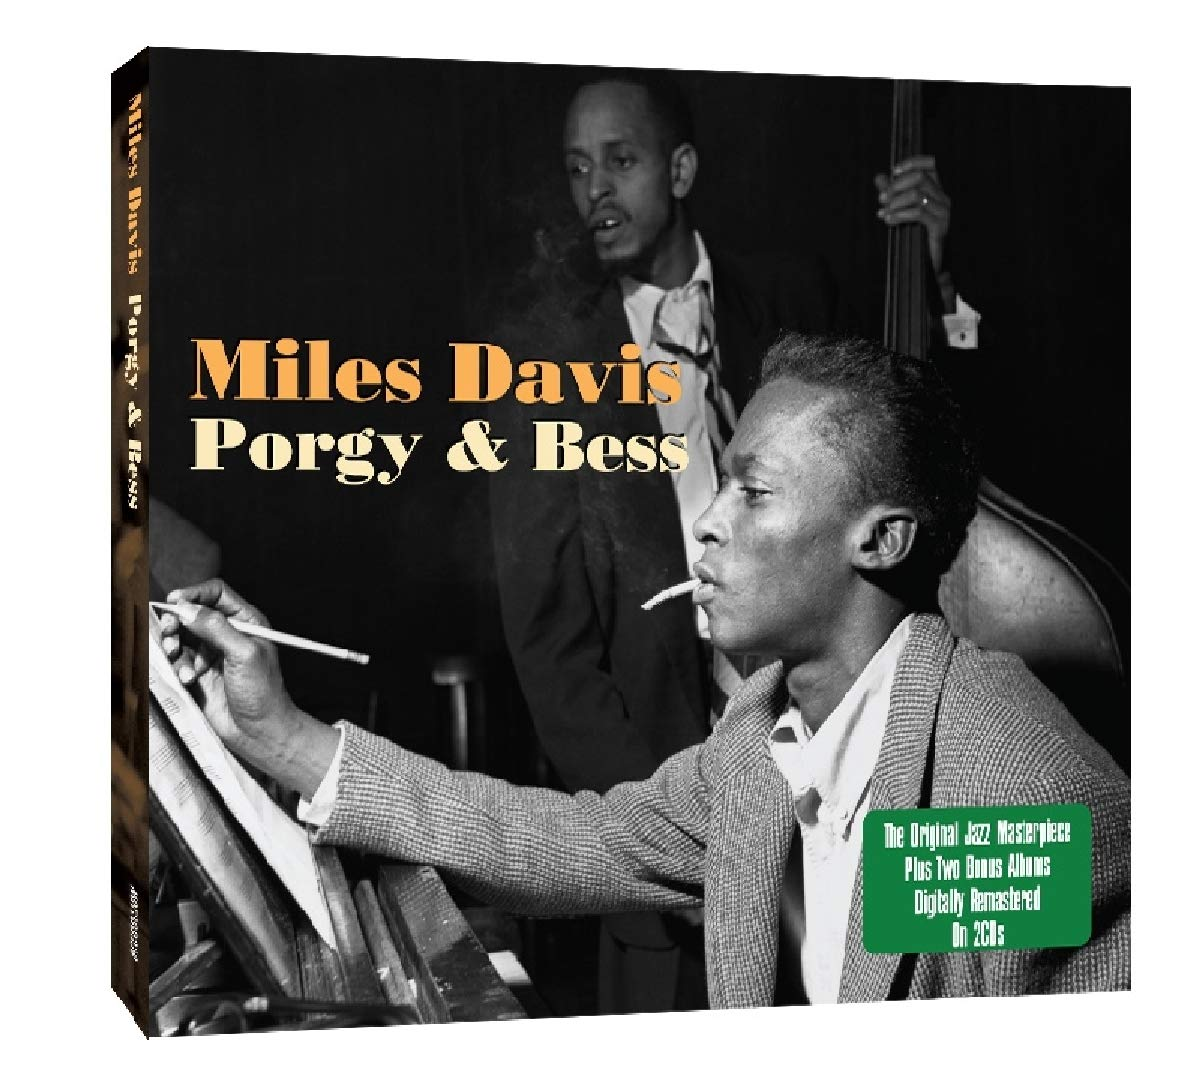 Miles Davis – Porgy & Bess (2010) [FLAC]